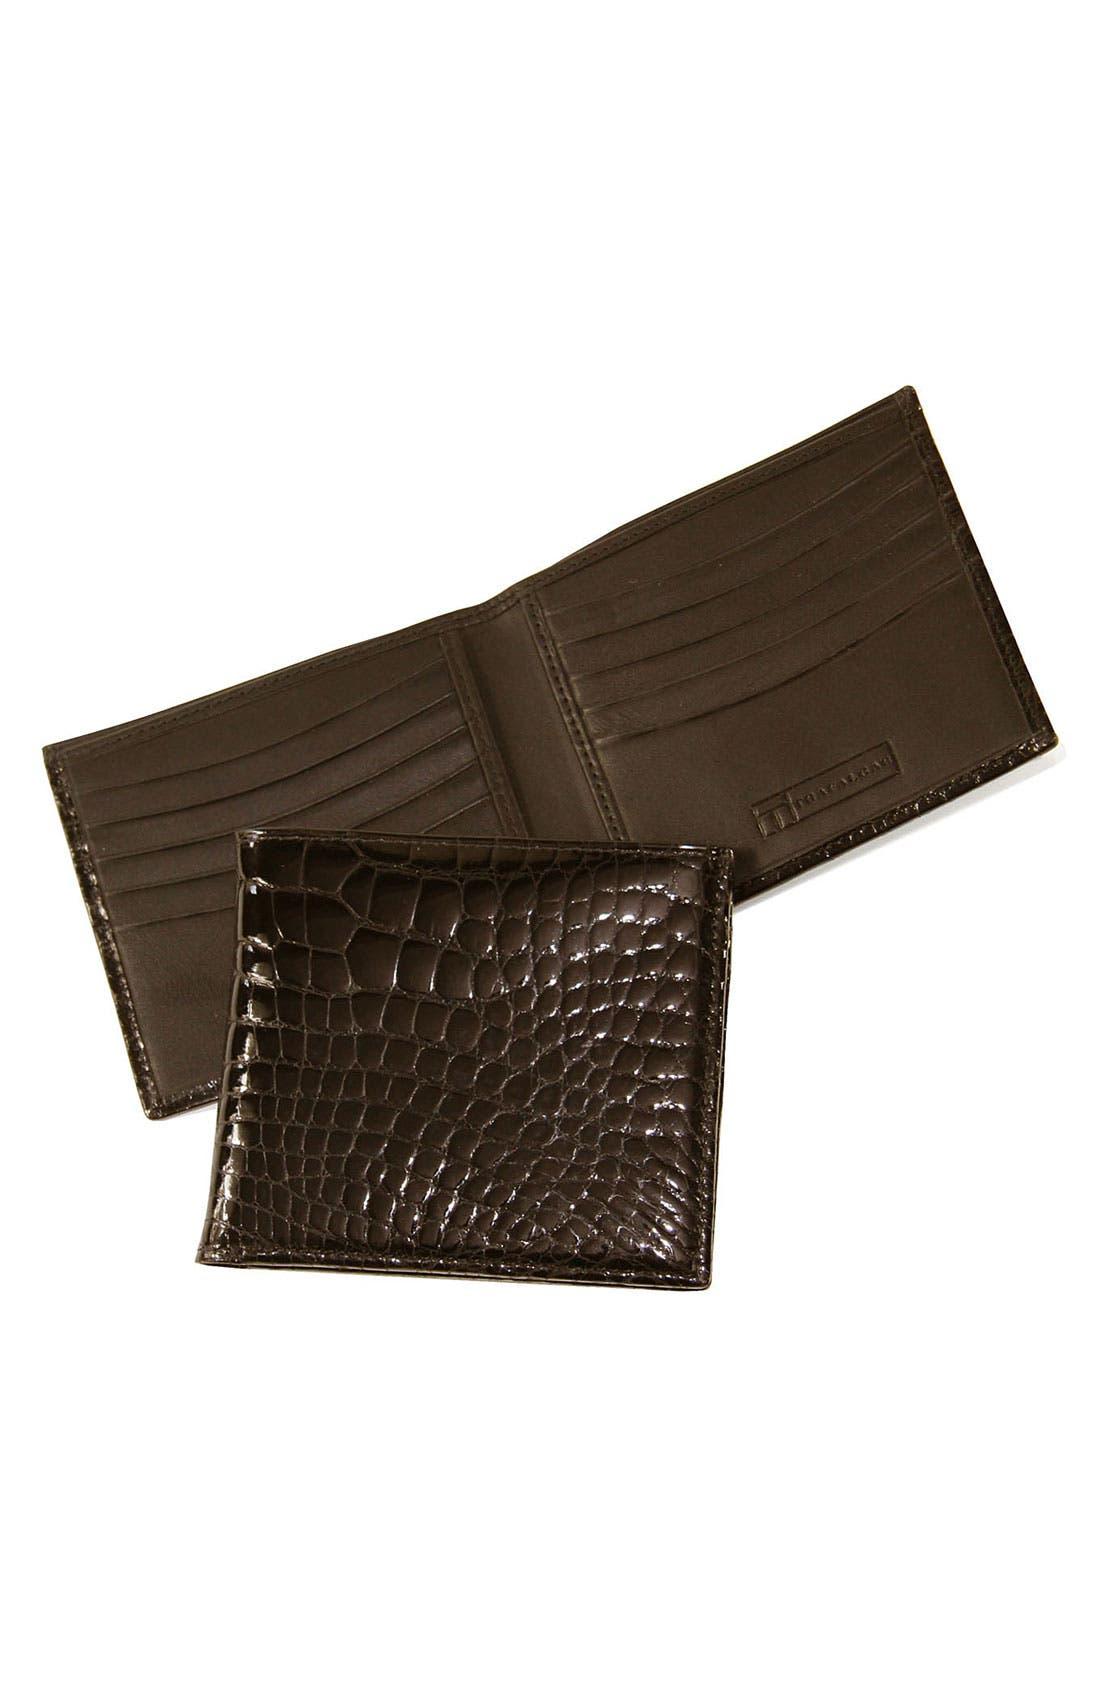 Main Image - Trafalgar Genuine Alligator Wallet